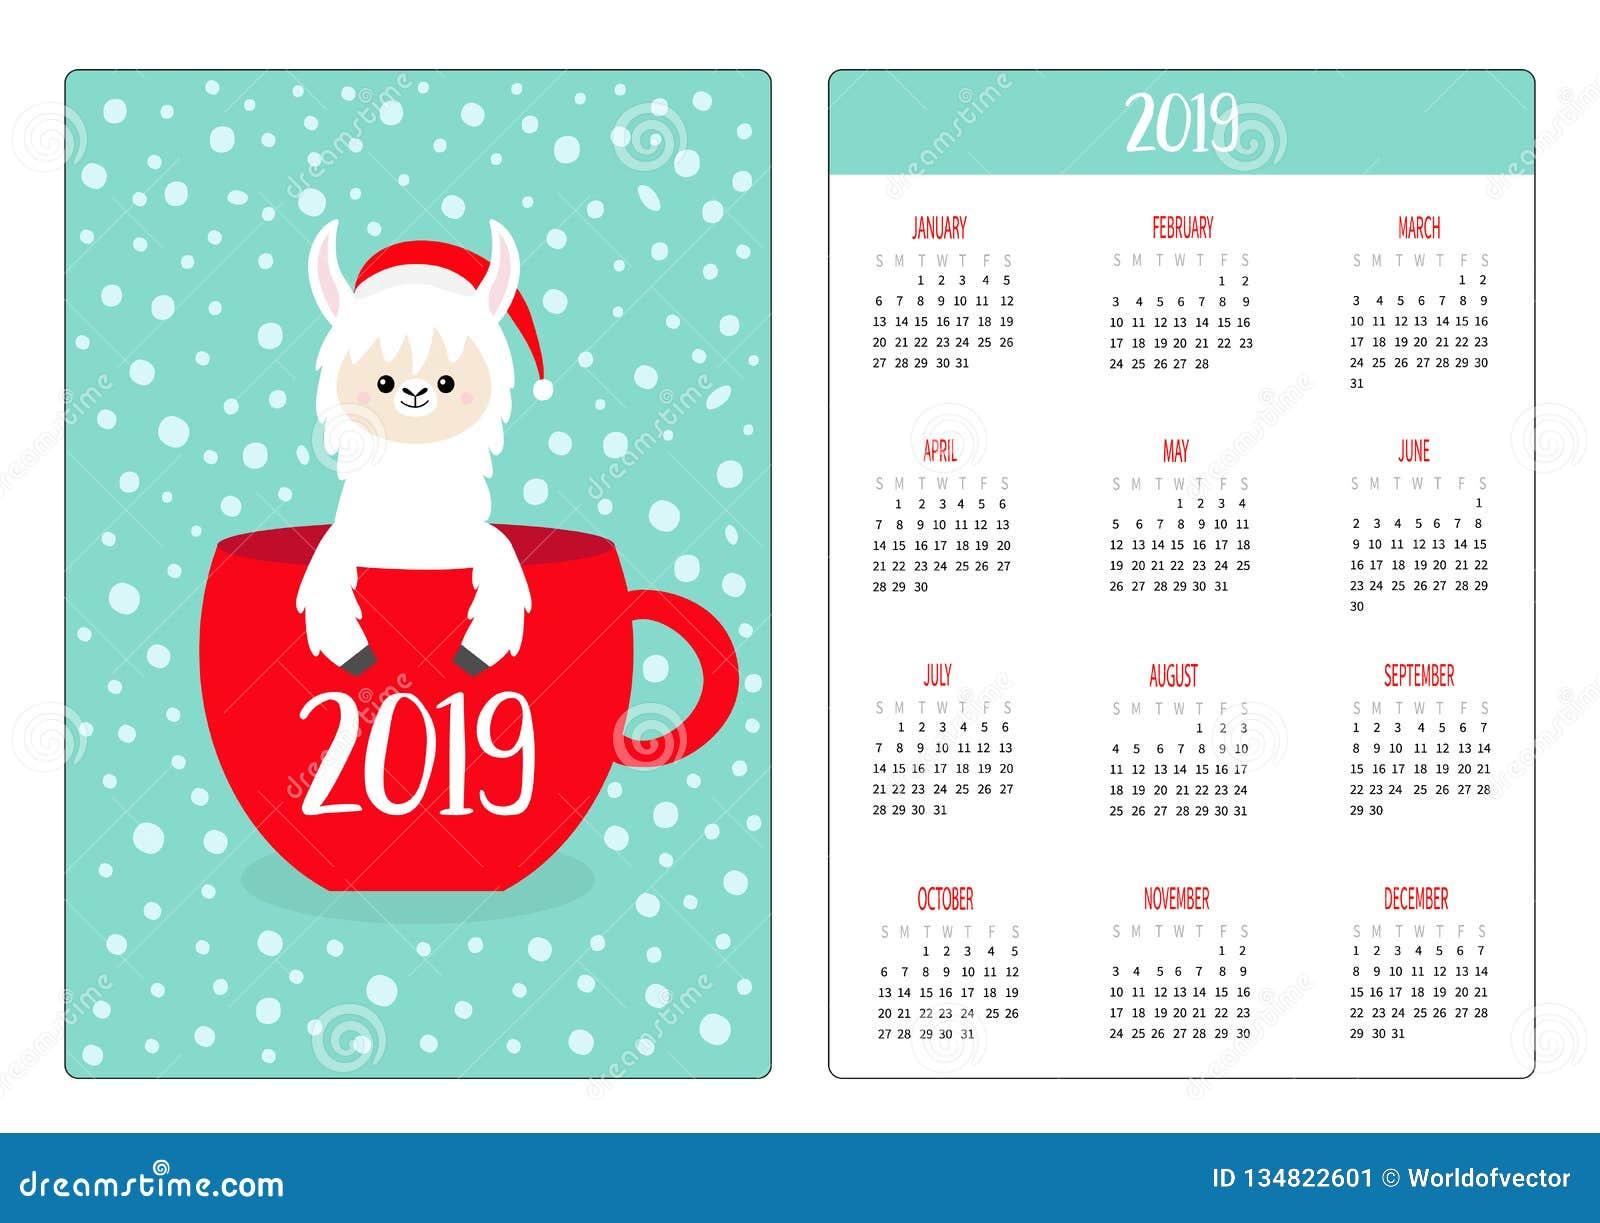 61c5f3dba7db Coffee tea cup. Santa hat. Pocket calendar layout 2019 new year. Vertical  orientation. Week starts Sunday.